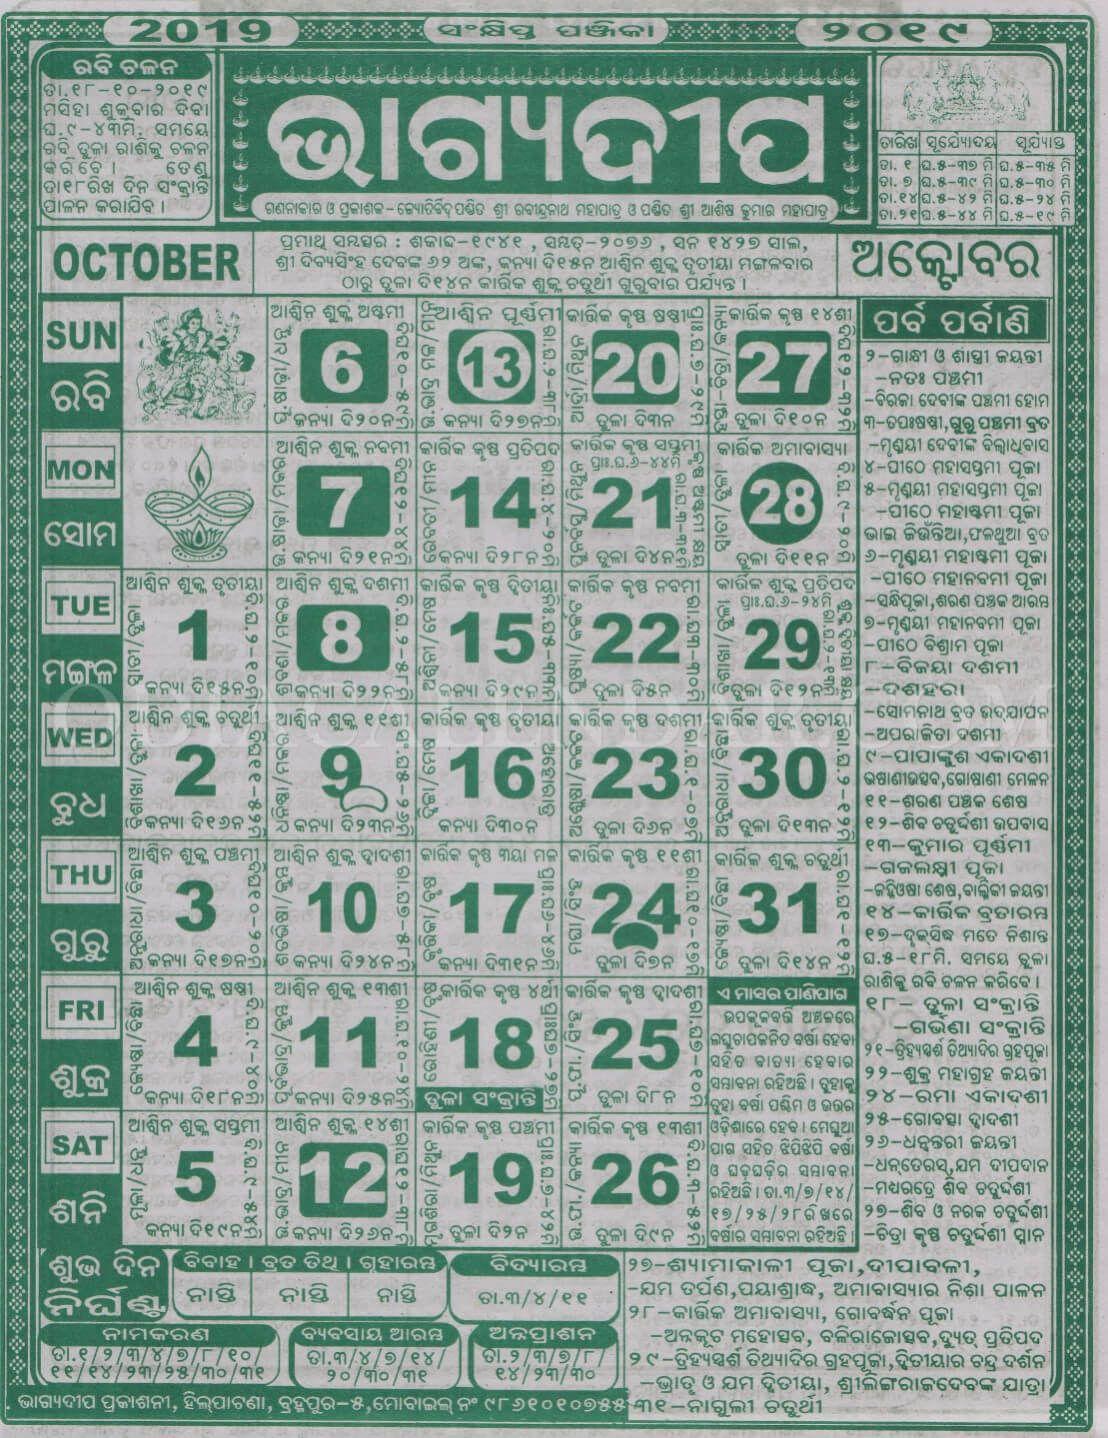 Bhagyadeep Calendar October 2019 | Calendar, App, December throughout Odia Calendar Bhagyadeep